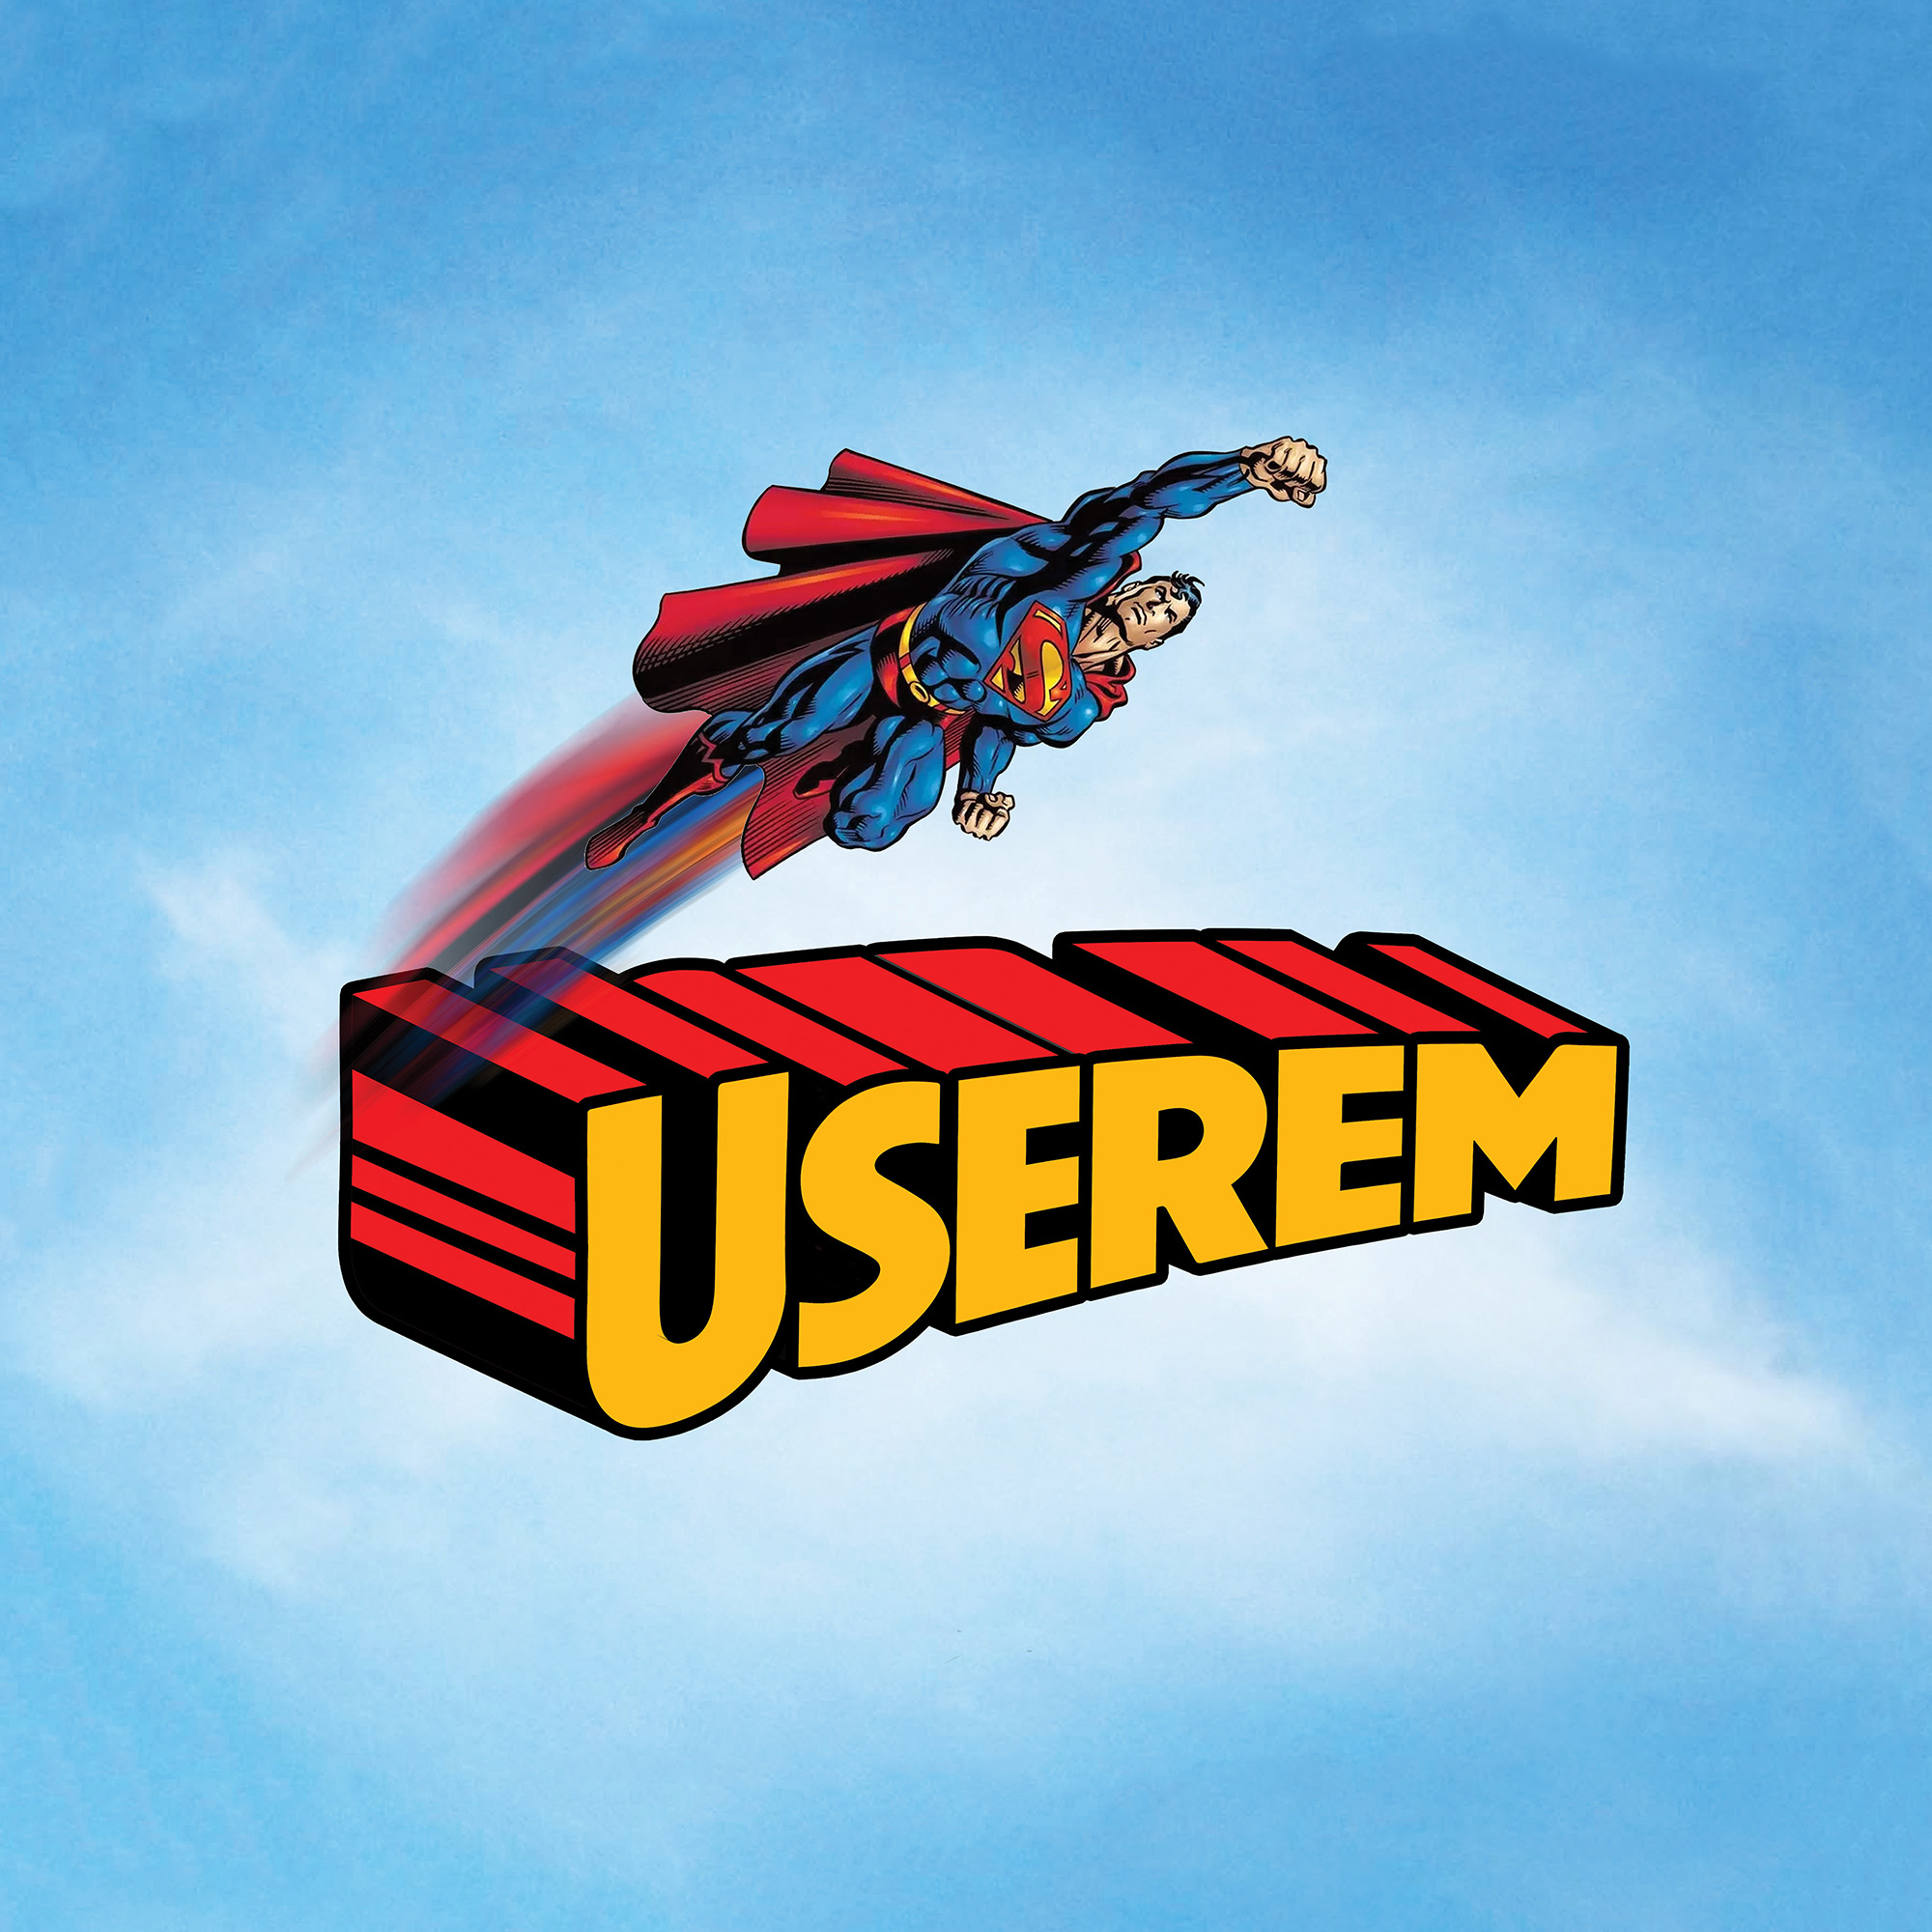 Userem